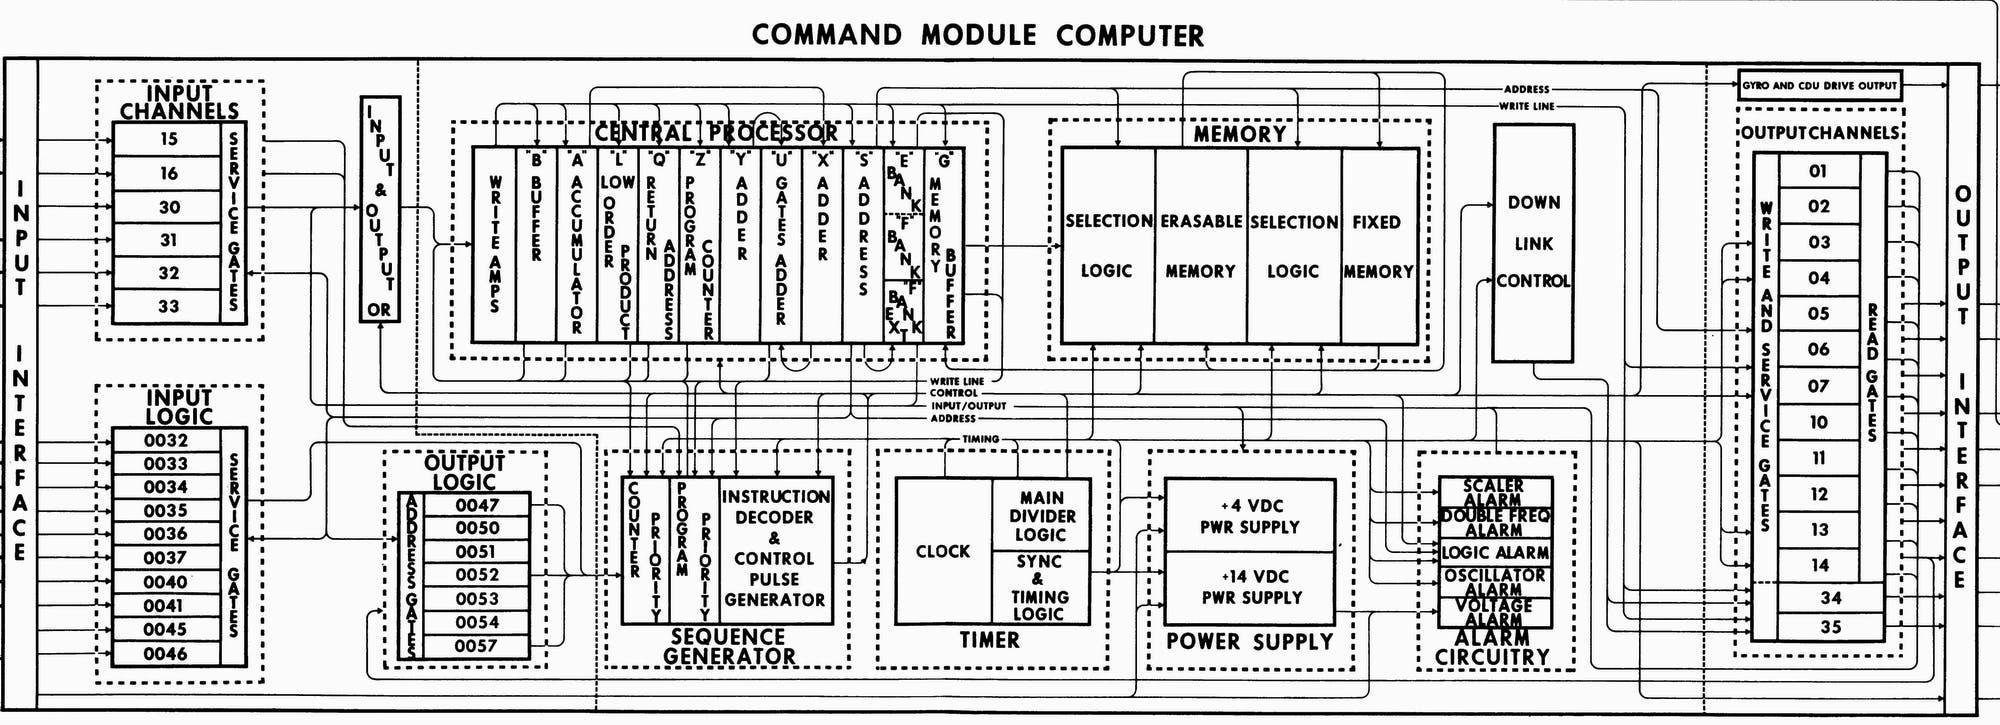 Apollo Guidance Computer Interface For Inertial Navigation